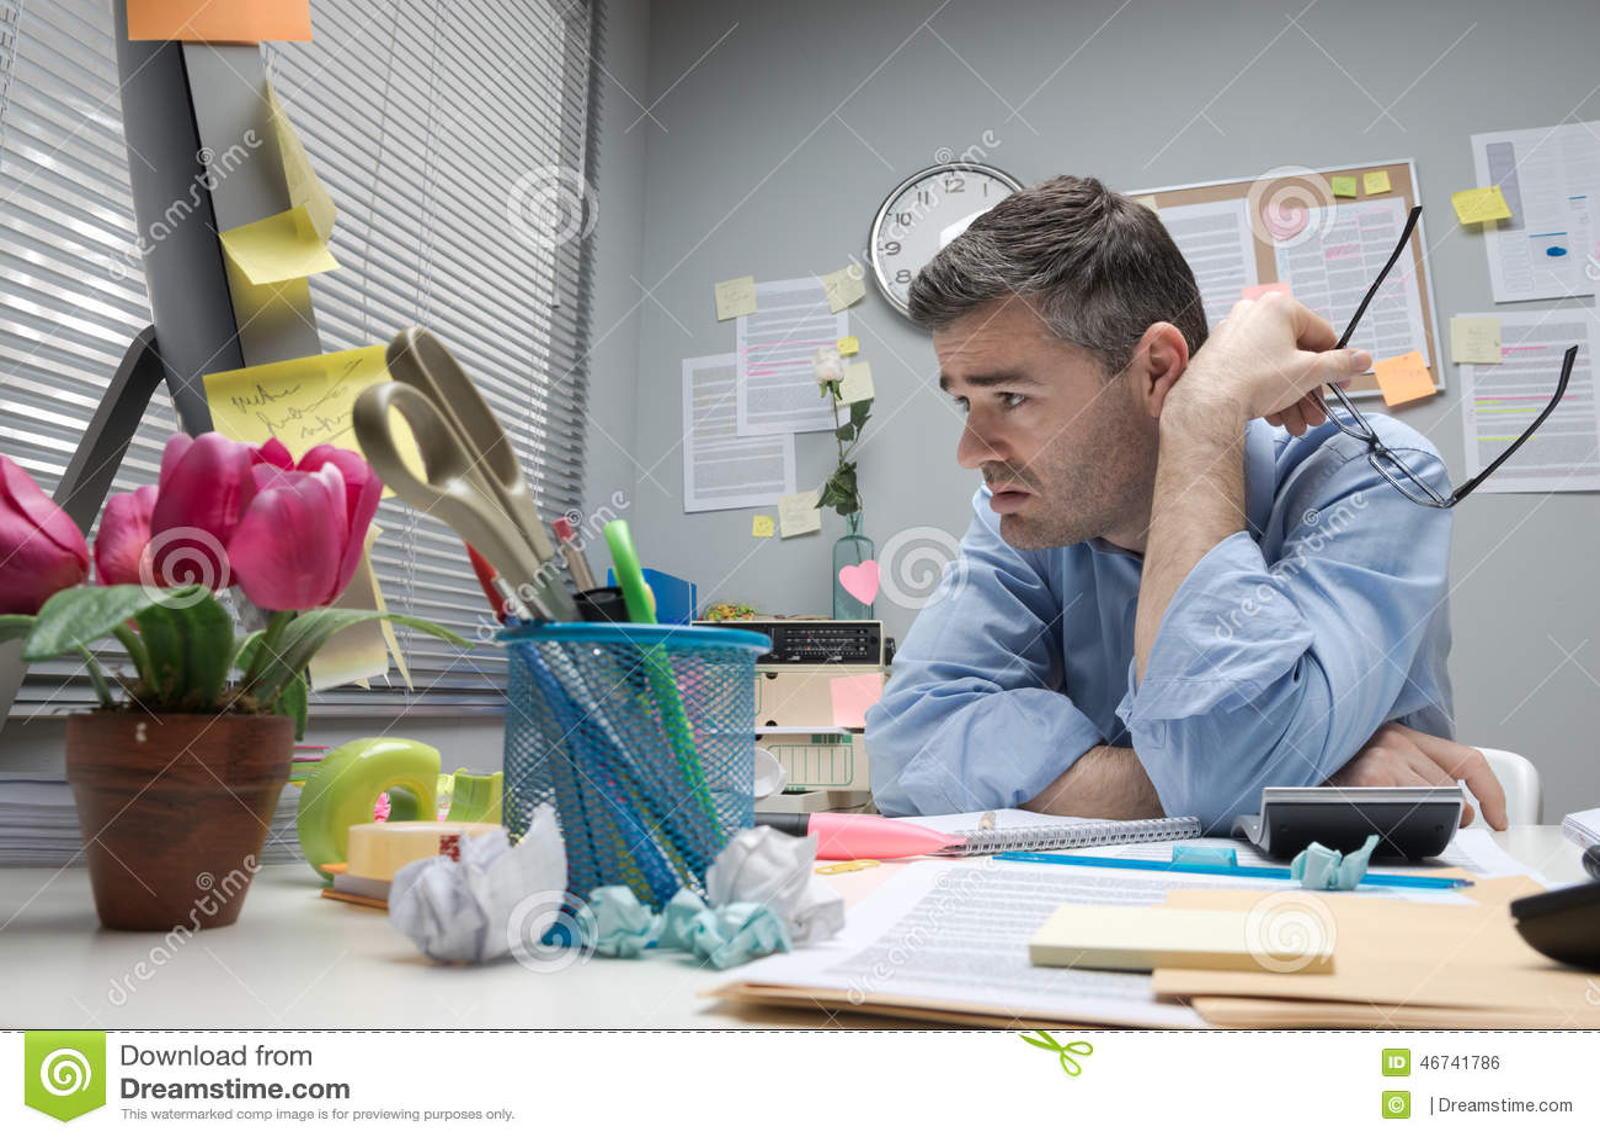 employ de bureau d prim son bureau photo stock image 46741786. Black Bedroom Furniture Sets. Home Design Ideas